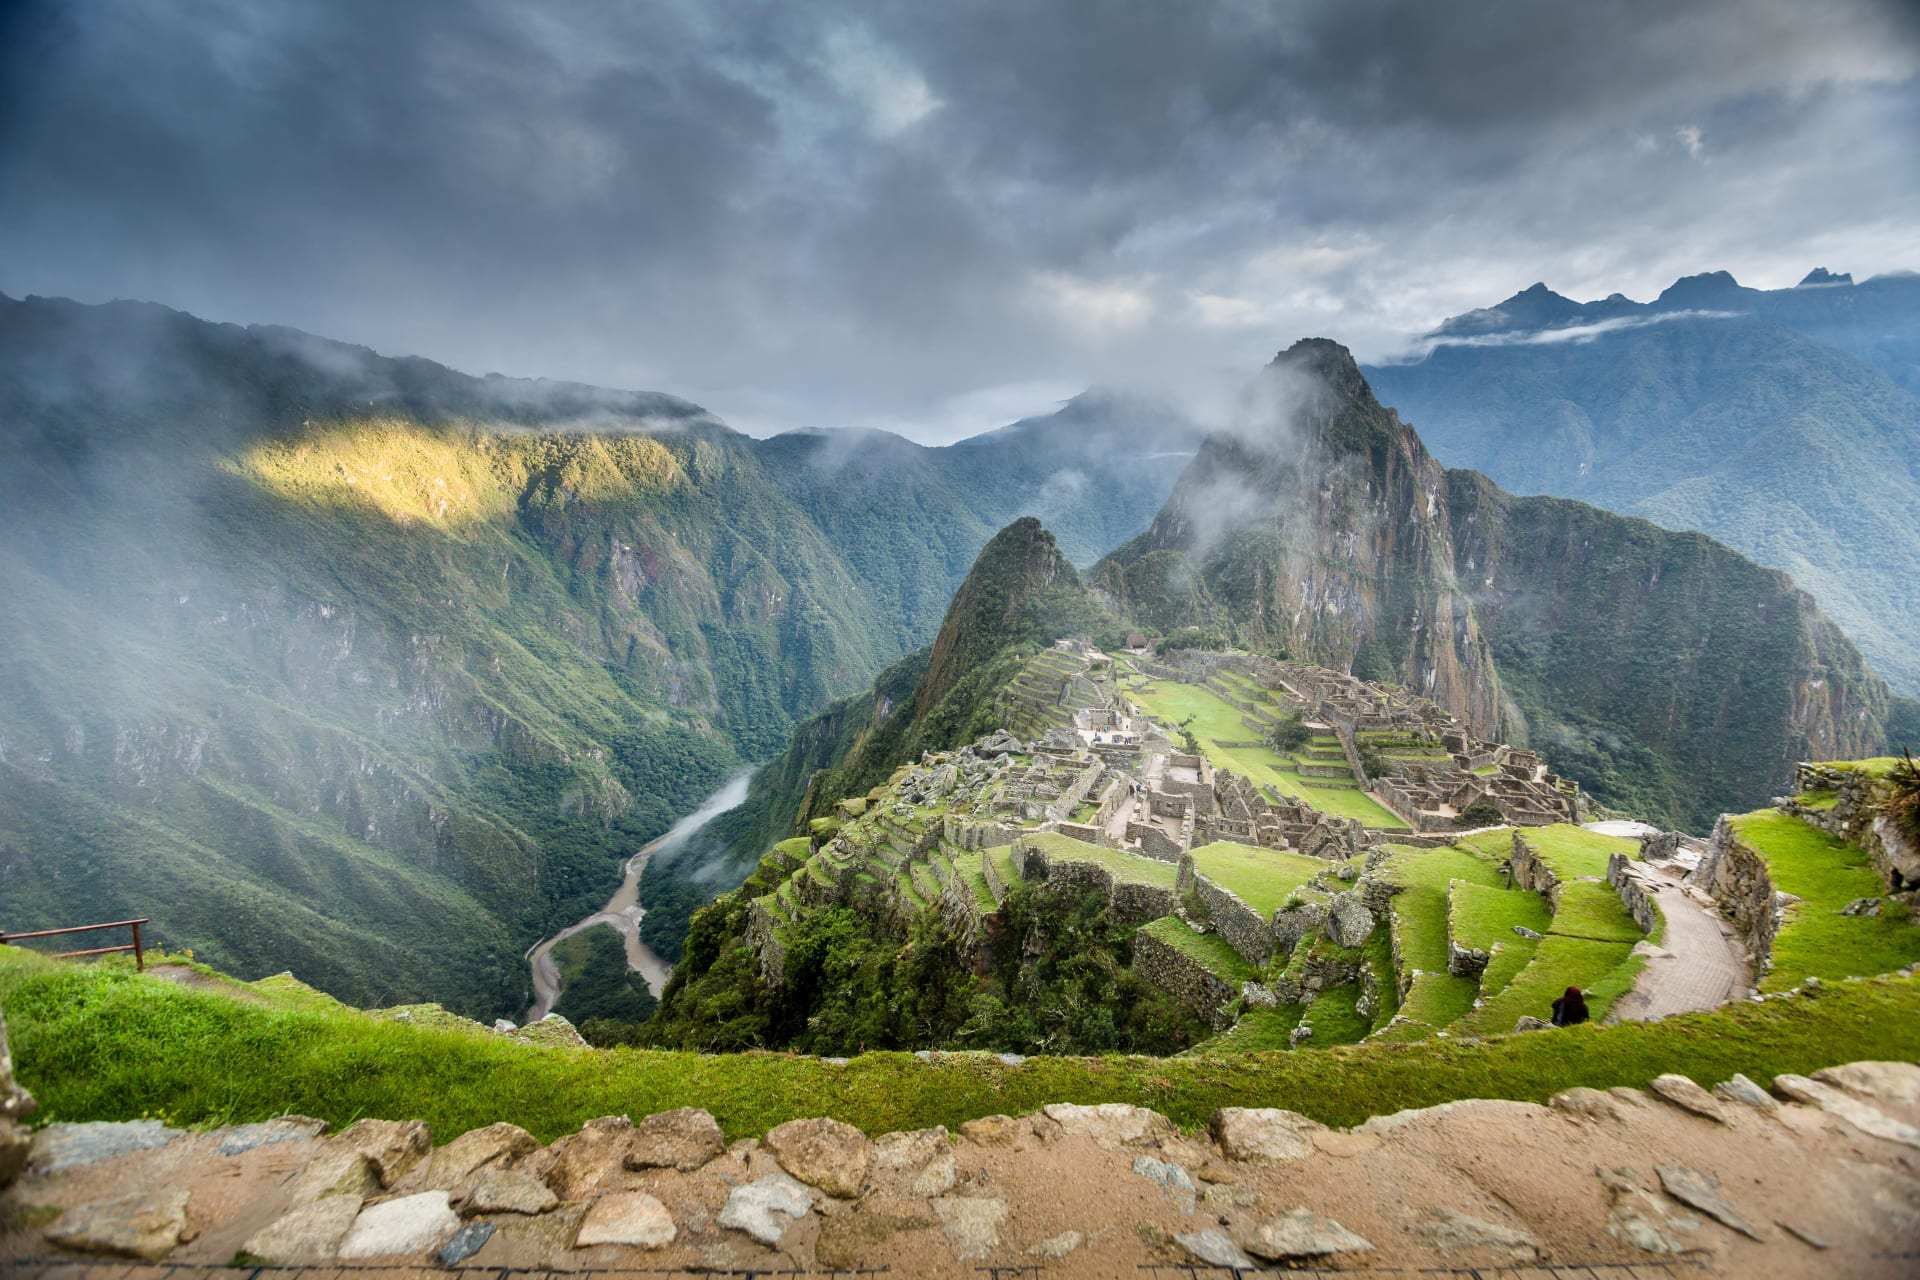 Machu Picchu - Winter Solstice Special: Machu Picchu's Most Important Sunrise of the Year